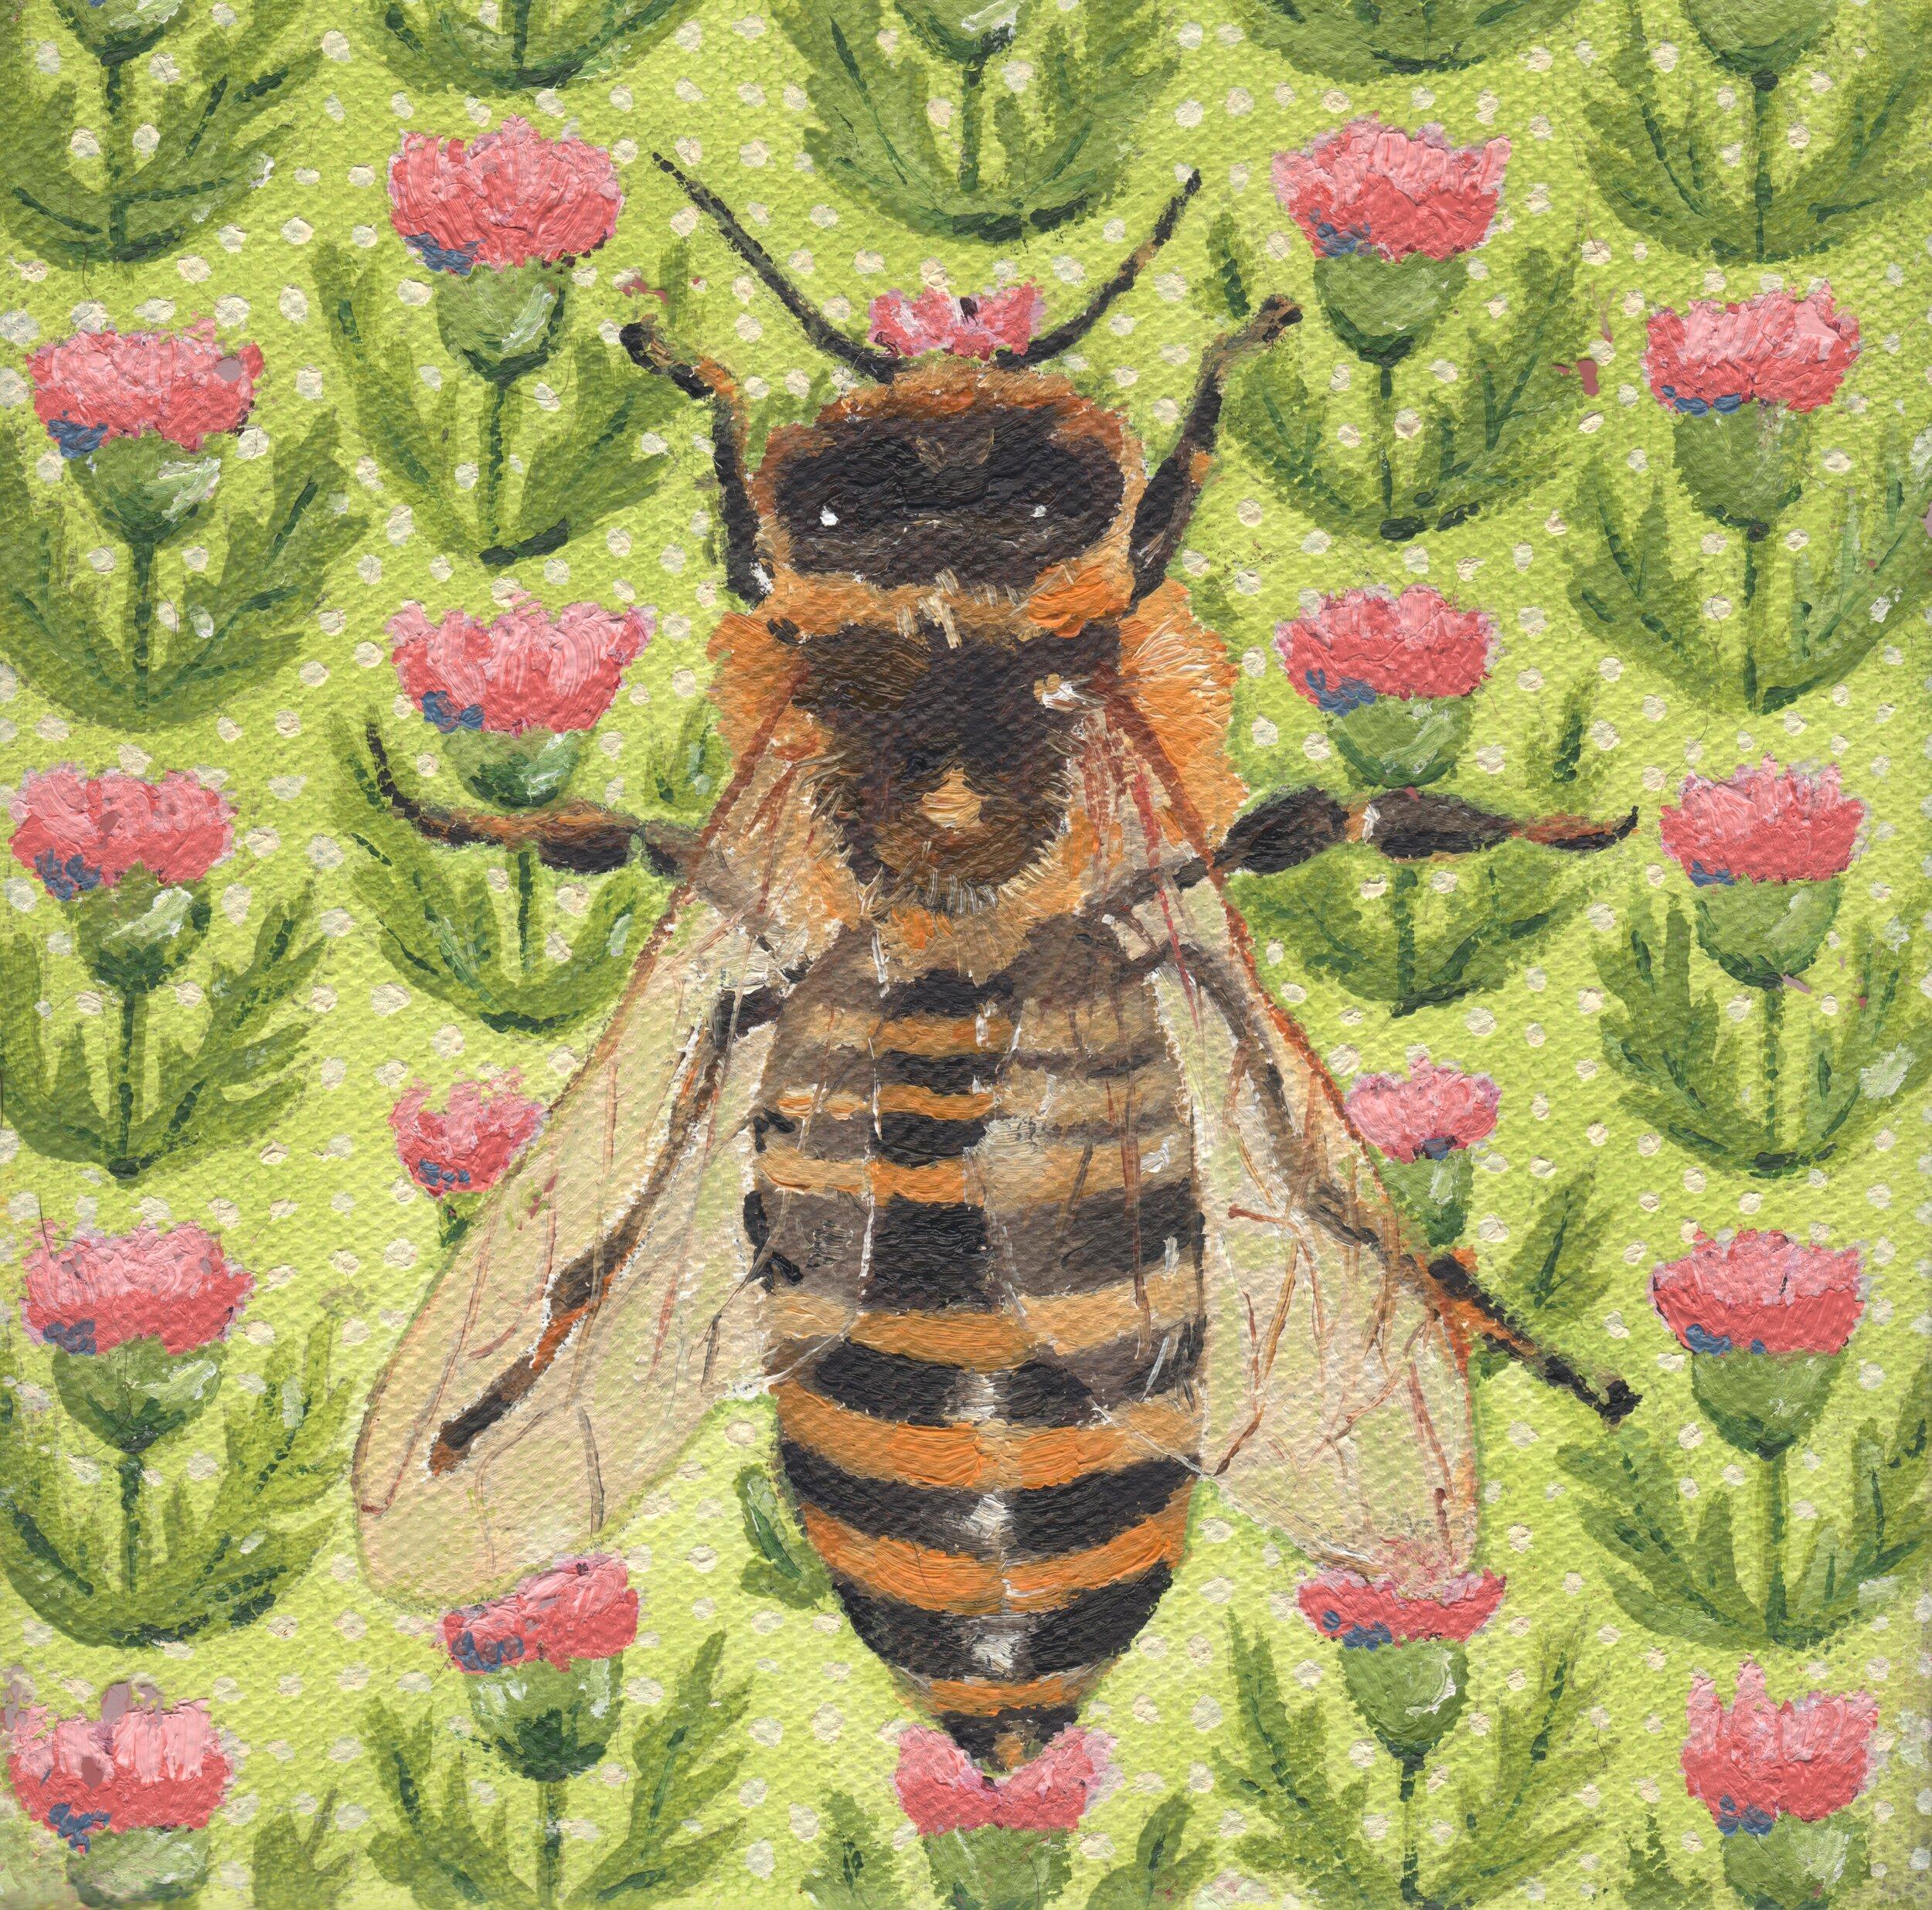 Bee II High Res.jpeg